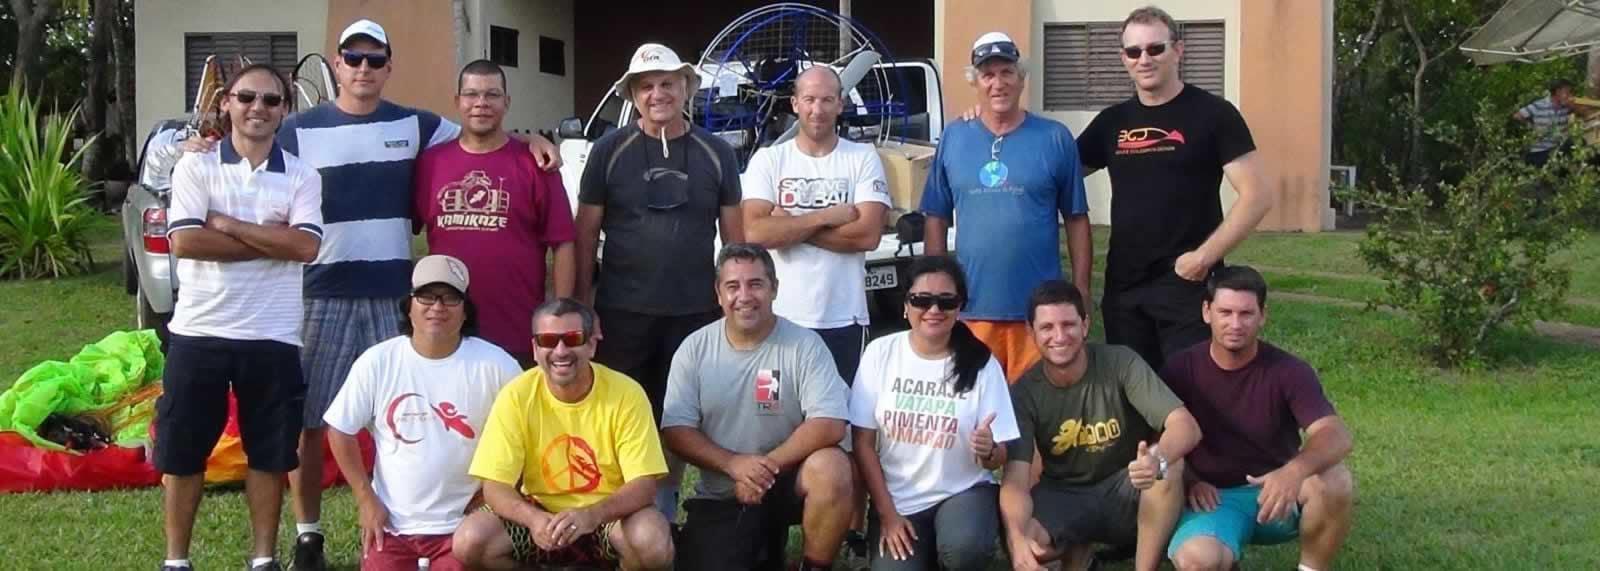 APPI PPG Instructor course in Brazil - APPI PPG